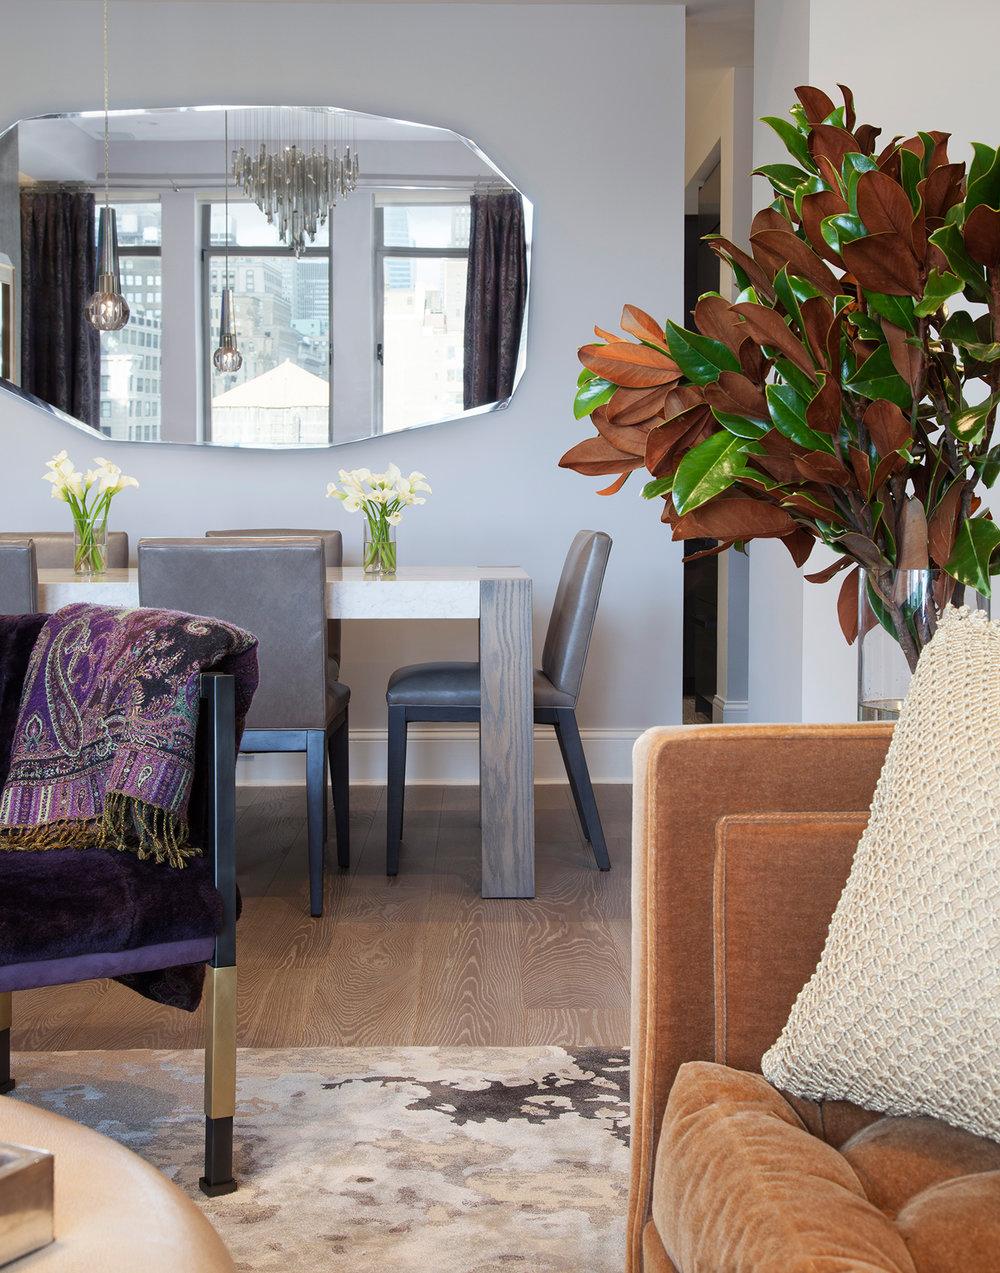 interior Design Photography in New York